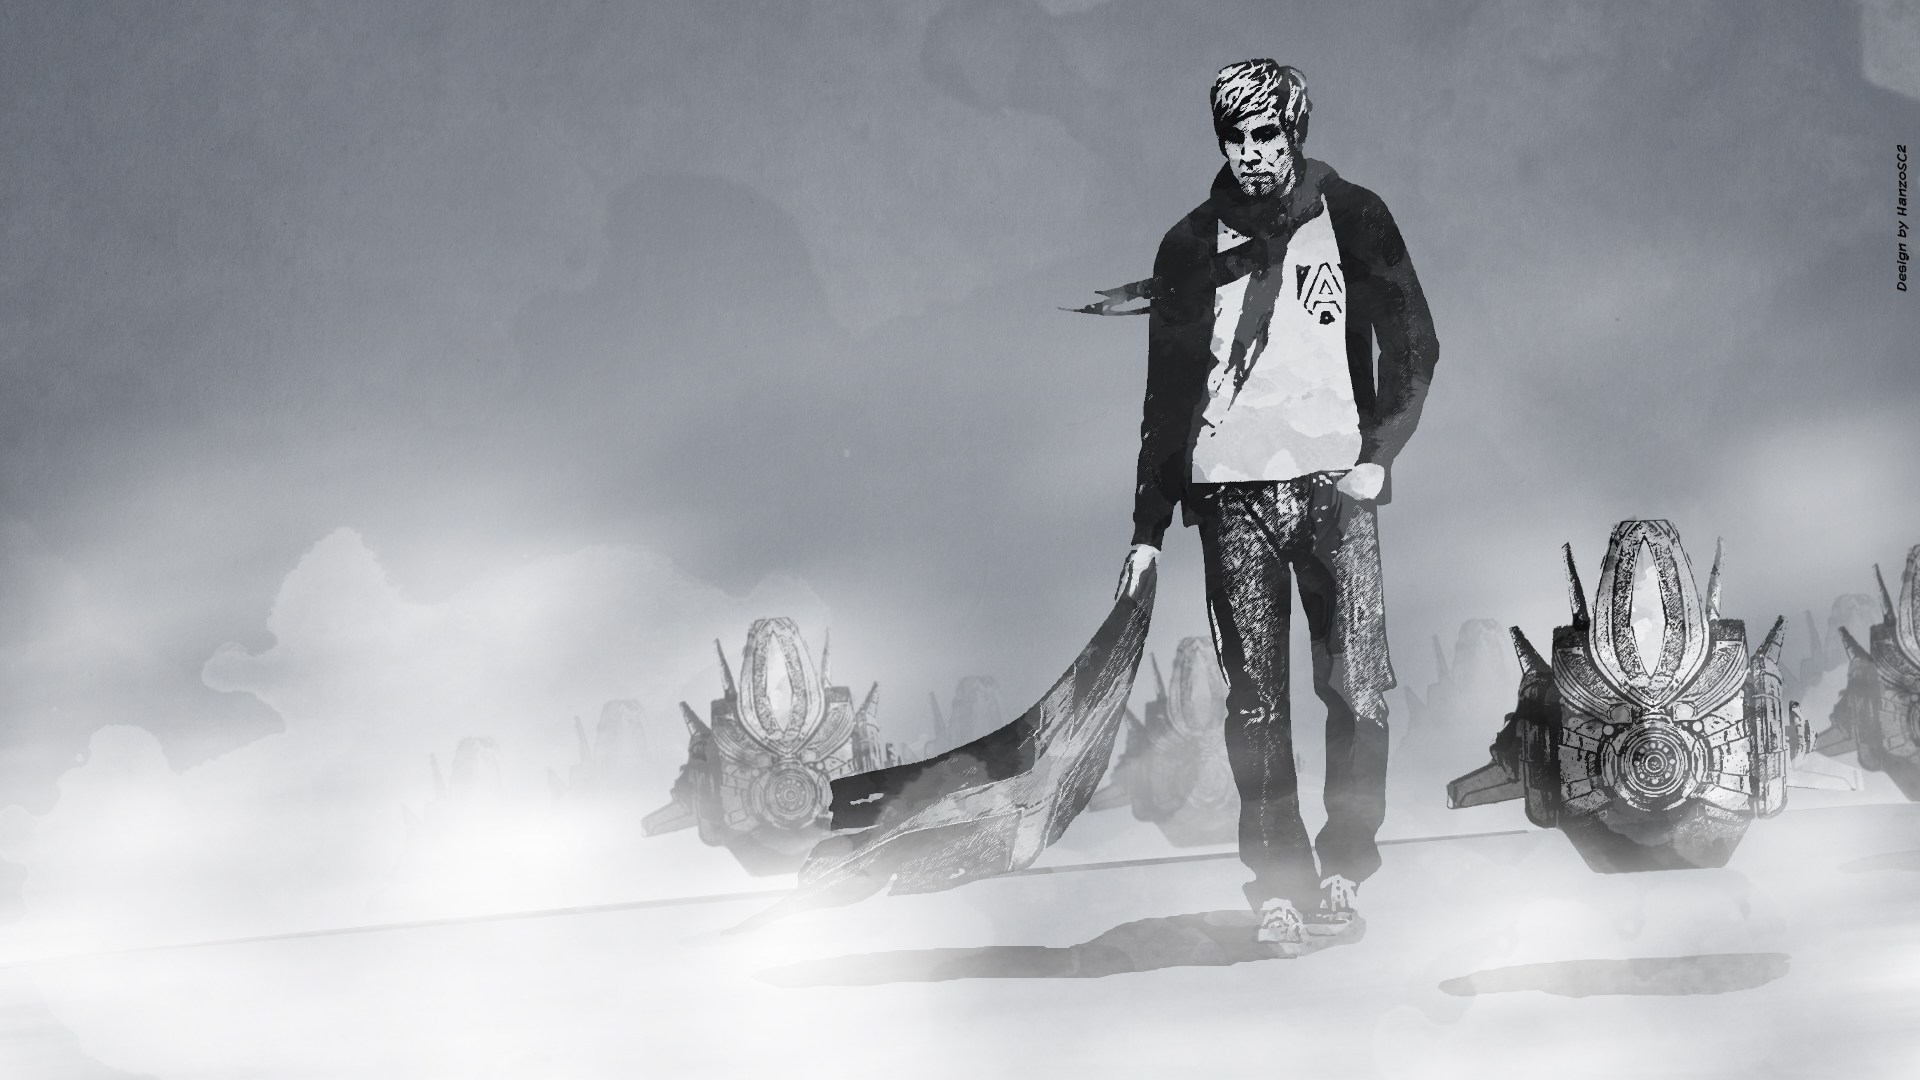 Naniwa - The King in the North by HanzoSC2